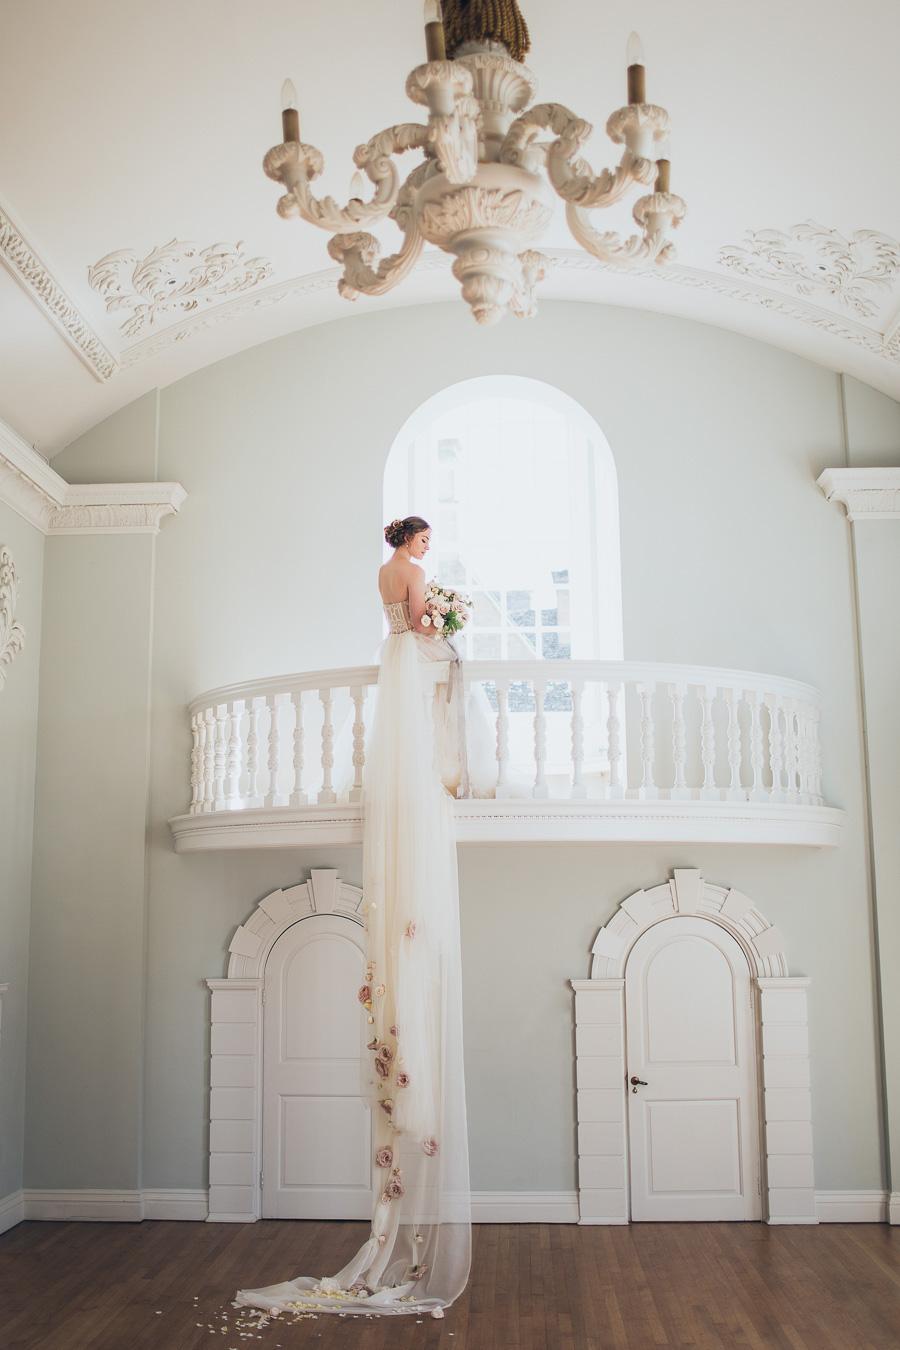 Tim Walker Inspired Wedding Photograph